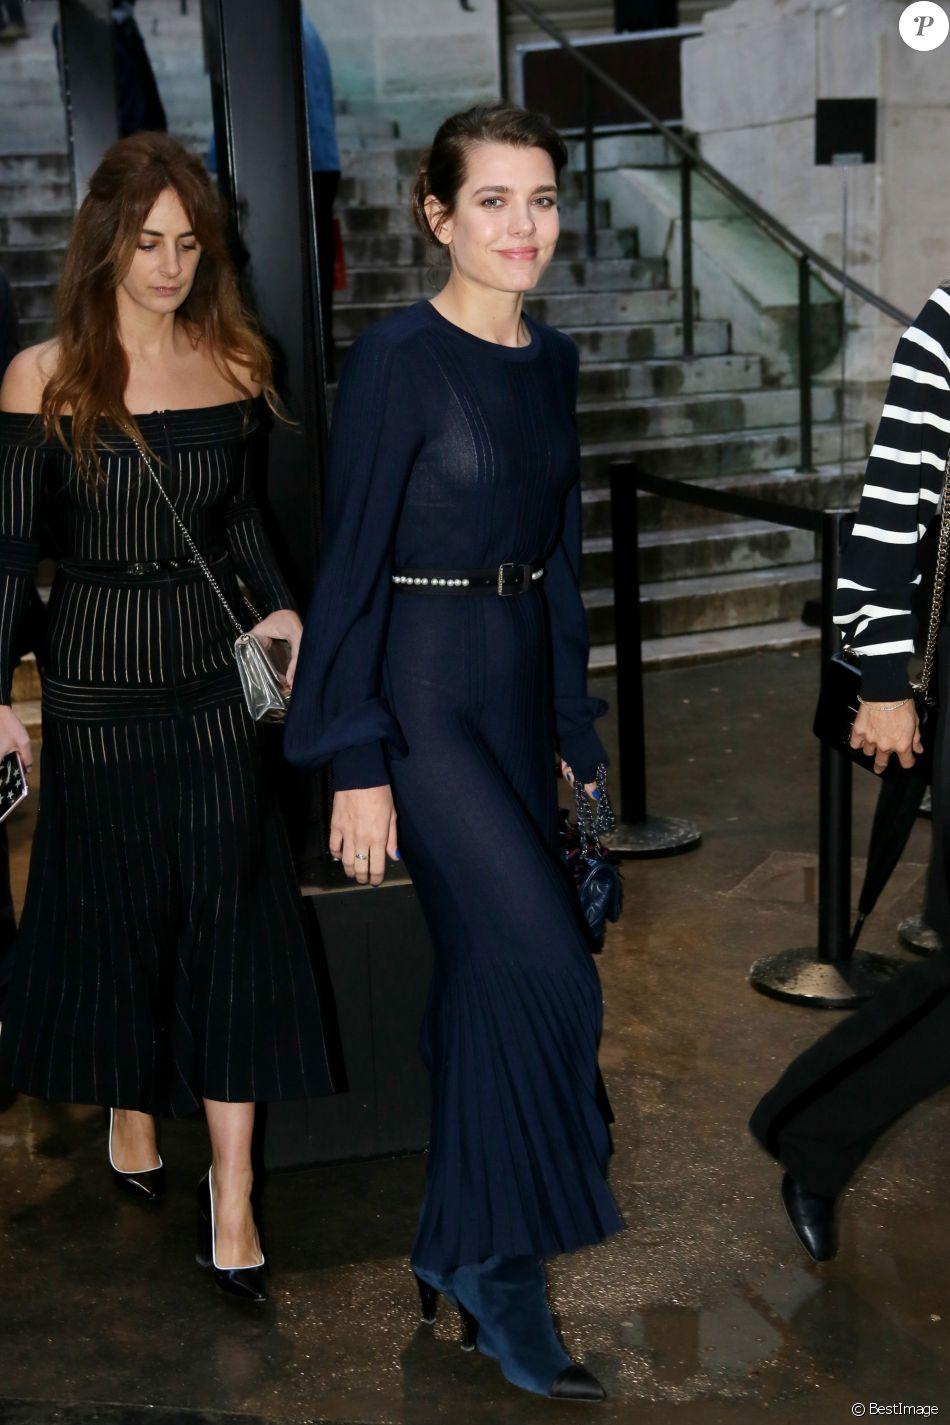 Nude defile at paris fashion week bvr - 2 10